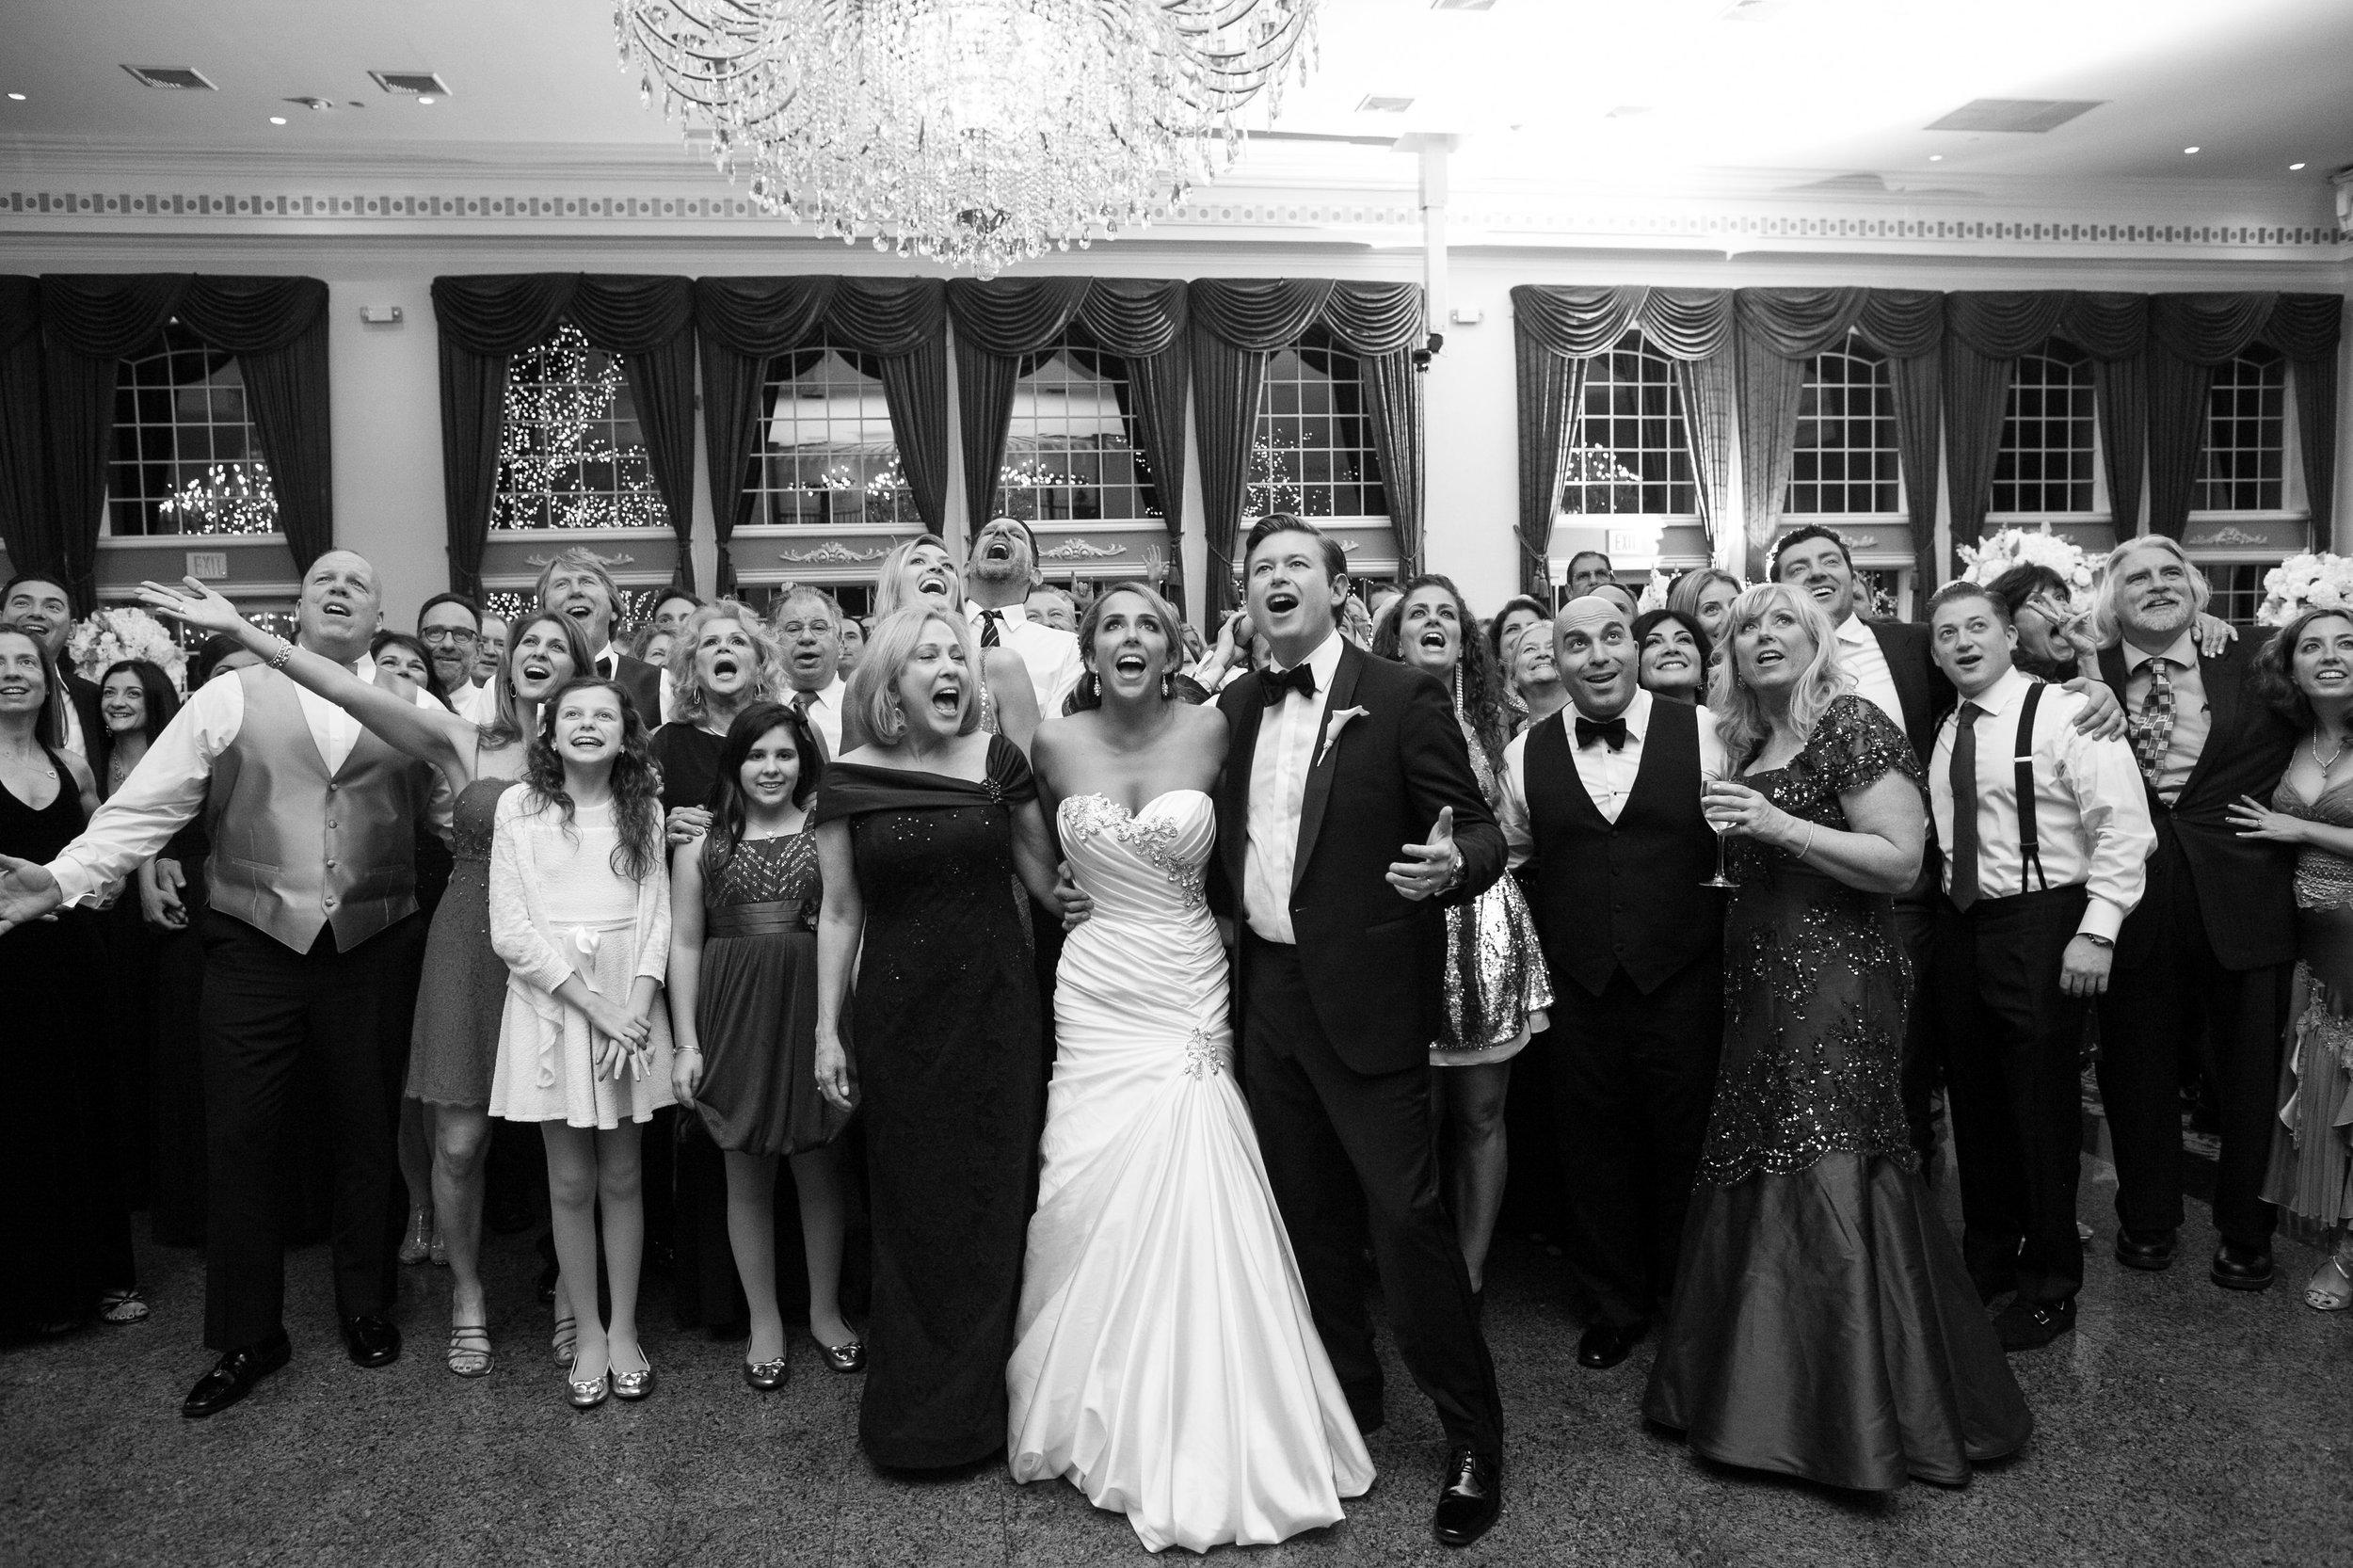 Ceci_New_York_Custom_Invitation_ New_Jersey_Wedding_Luxury_Personalized_Ceci_Style_Bride_Foil_Stamping171.JPG